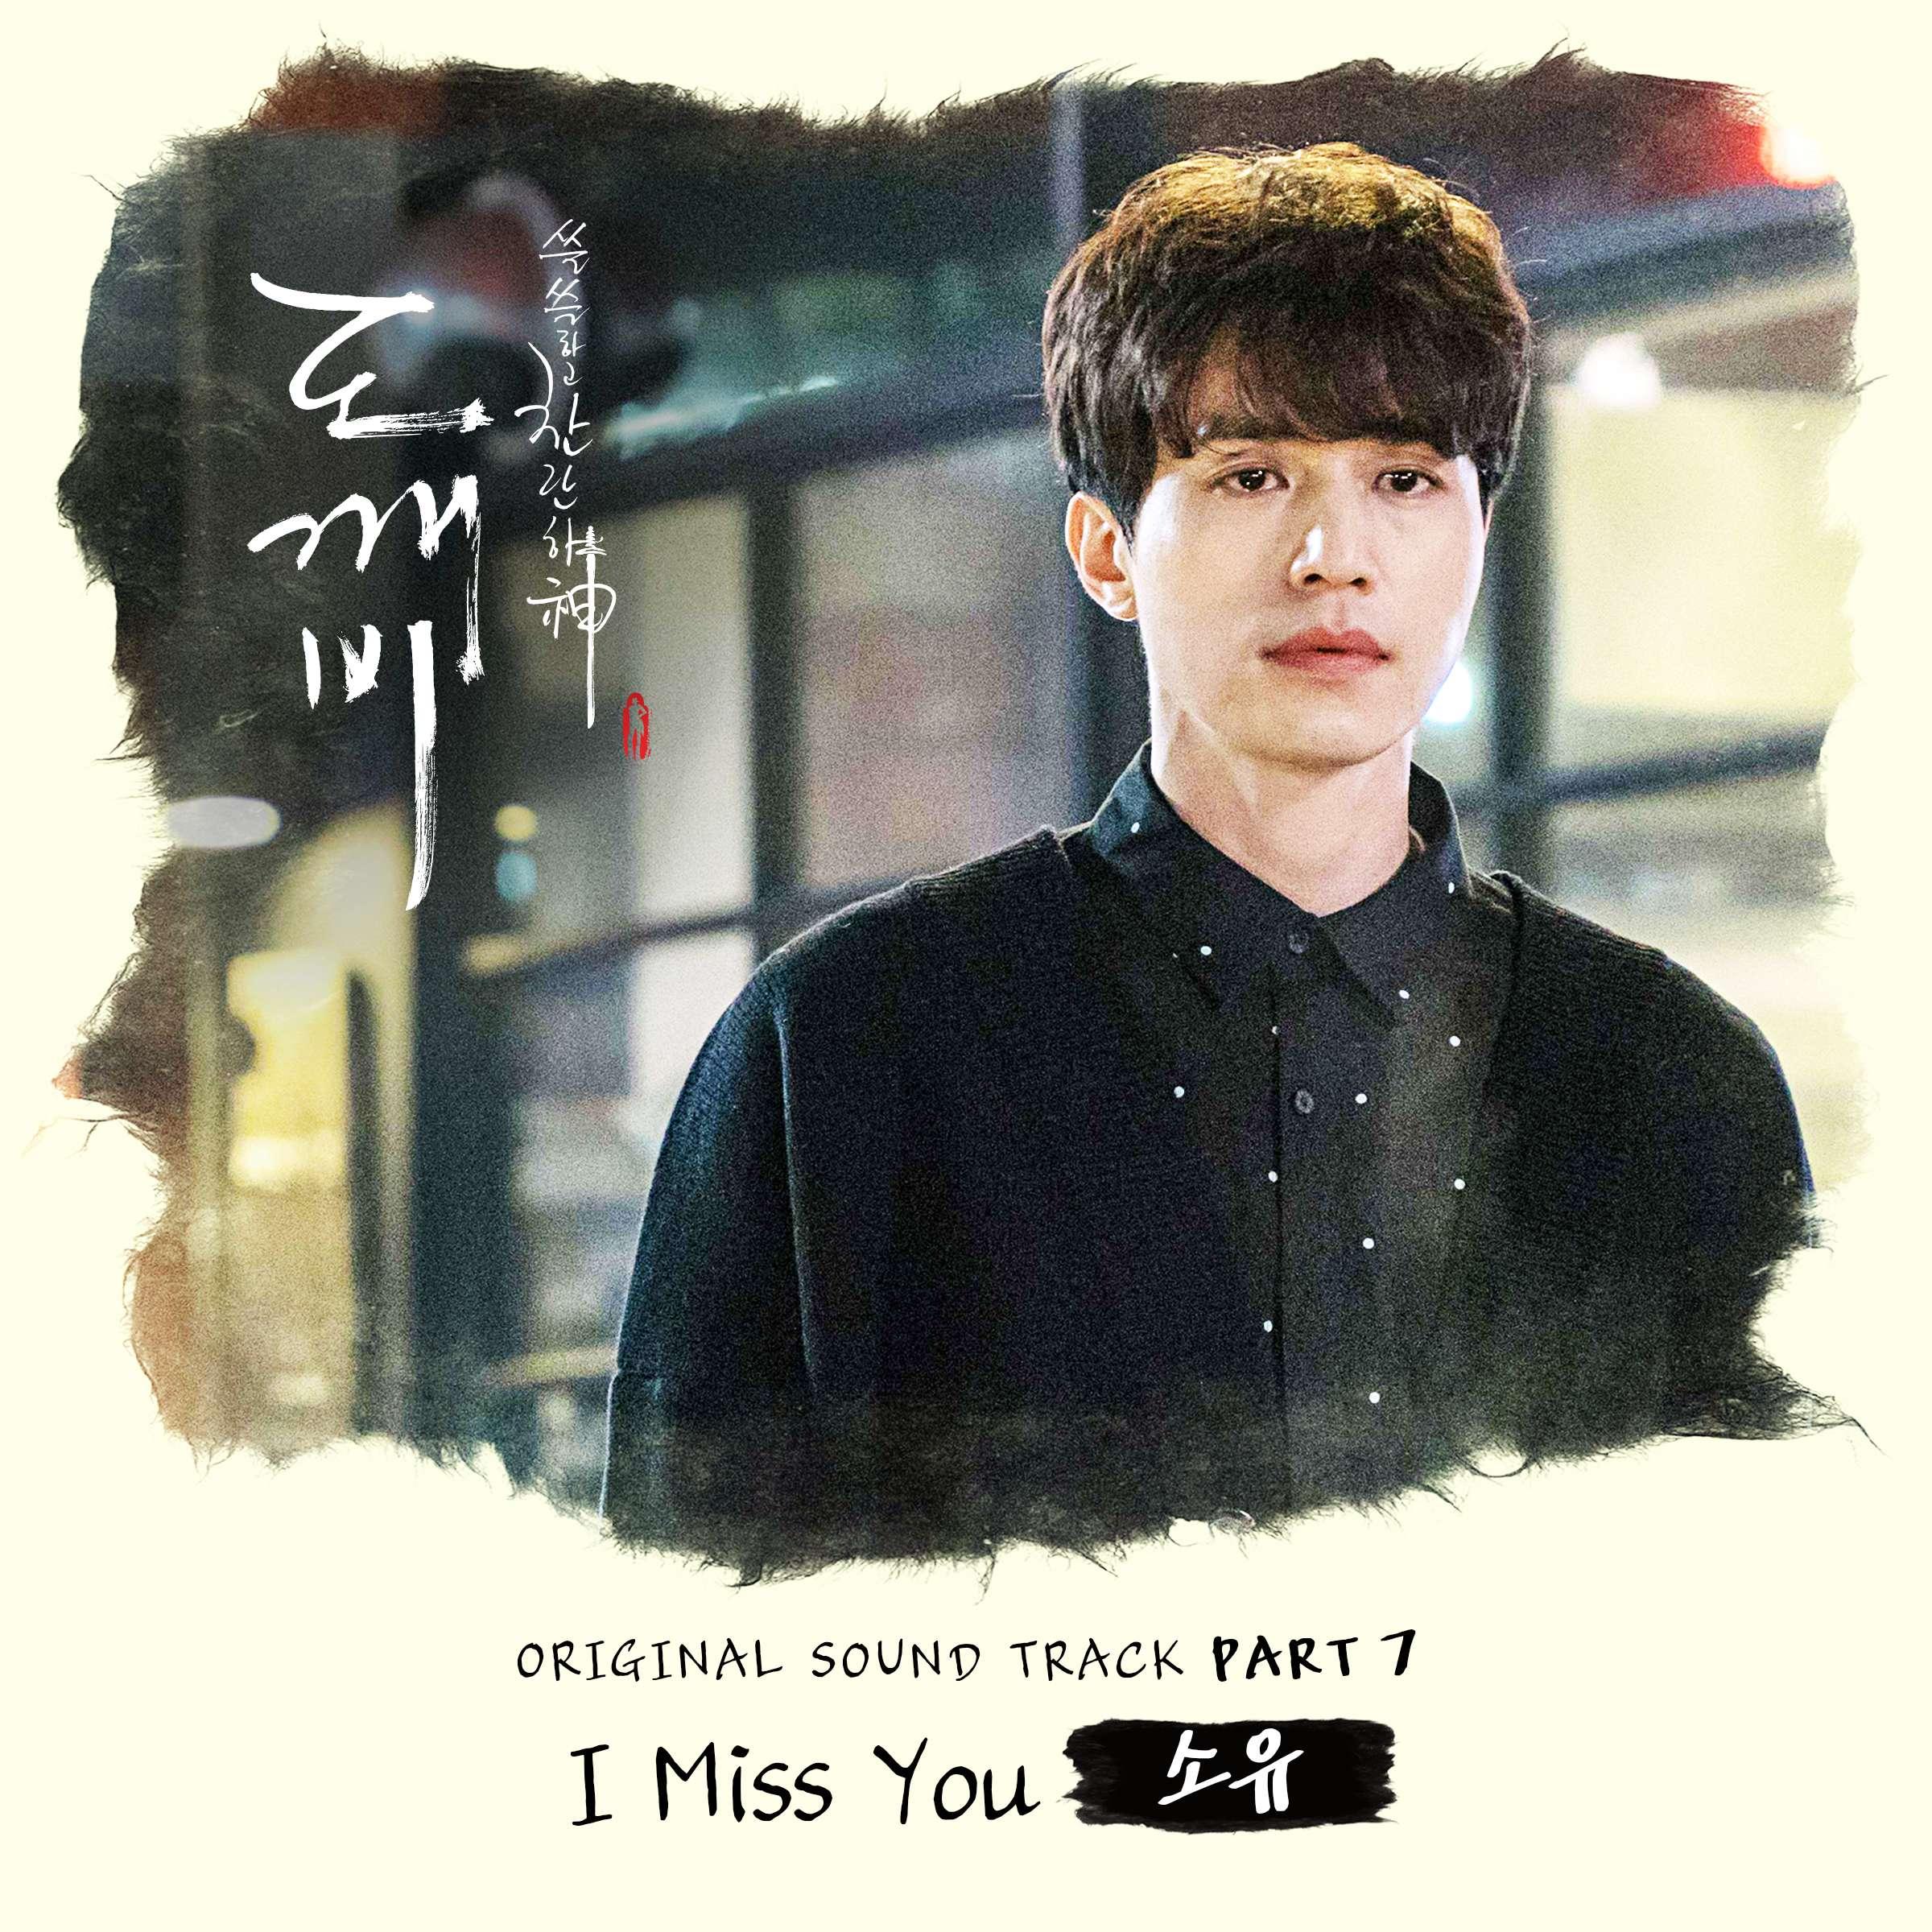 Soyou (Sistar) - Goblin OST Part. 7 - I Miss You K2Ost free mp3 download korean song kpop kdrama ost lyric 320 kbps